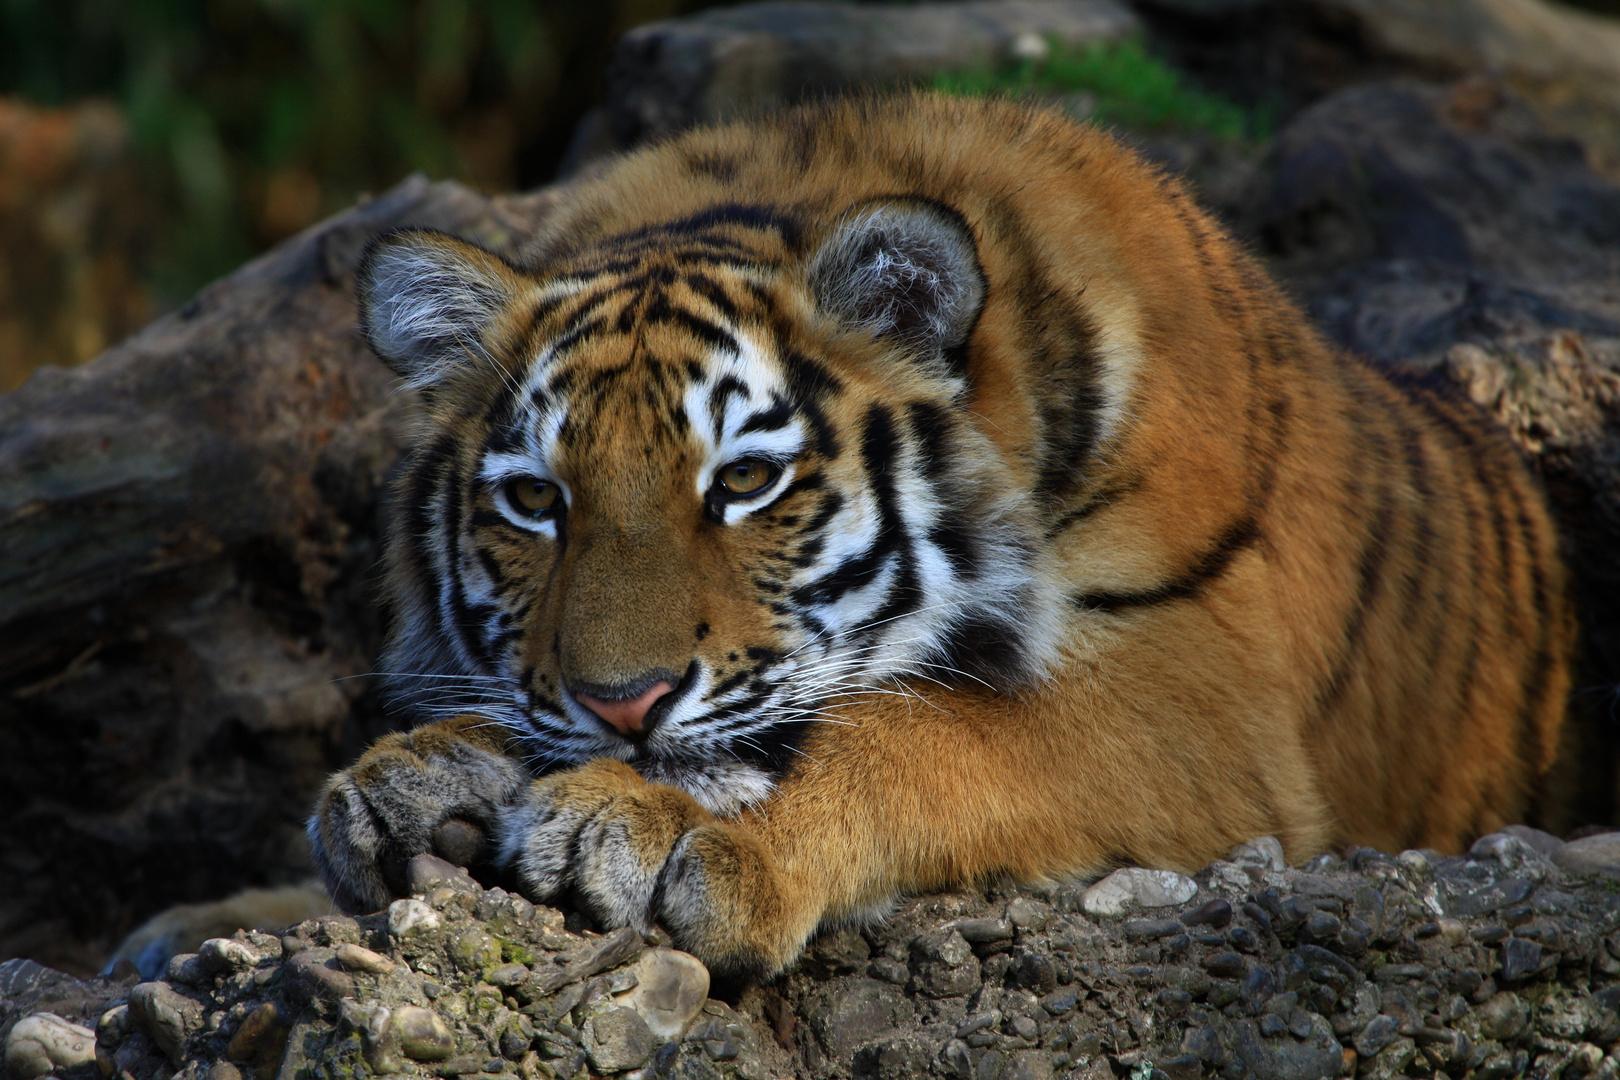 Tigerlady